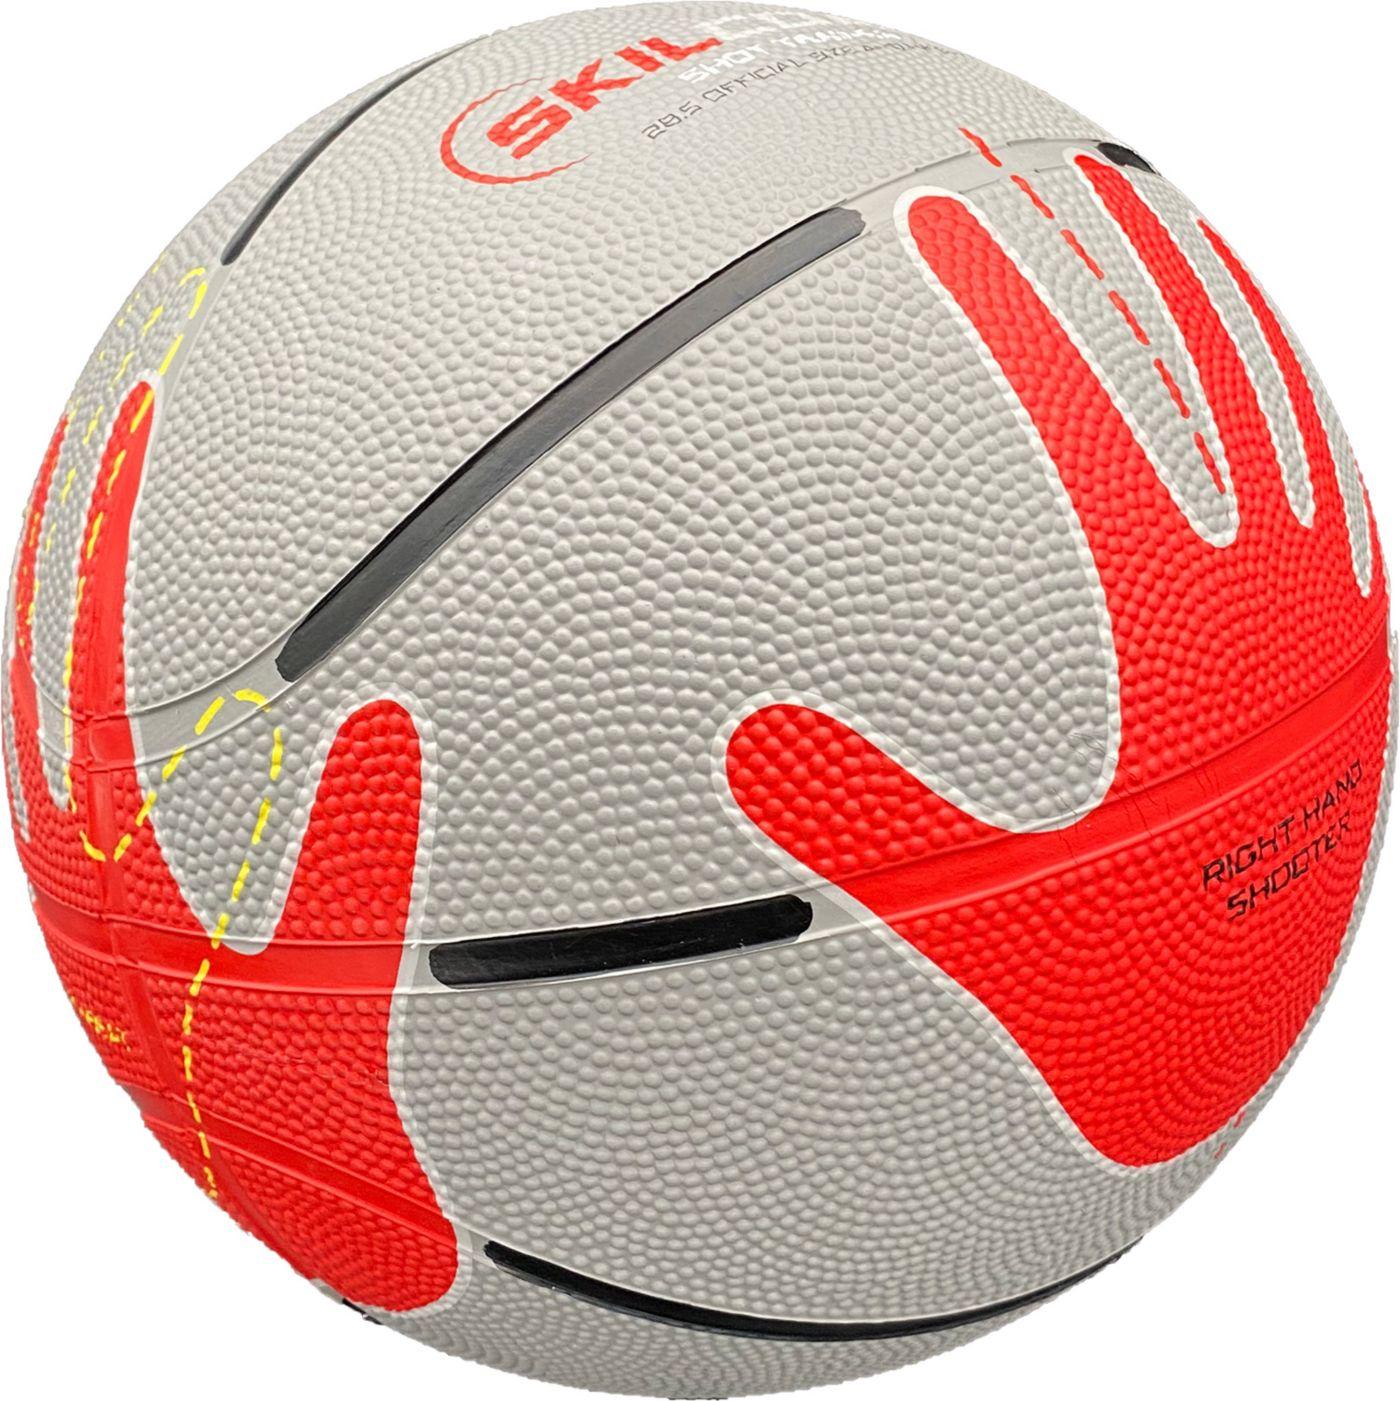 "Baden SkilCoach Youth Shooter's Basketball (27.5"")"